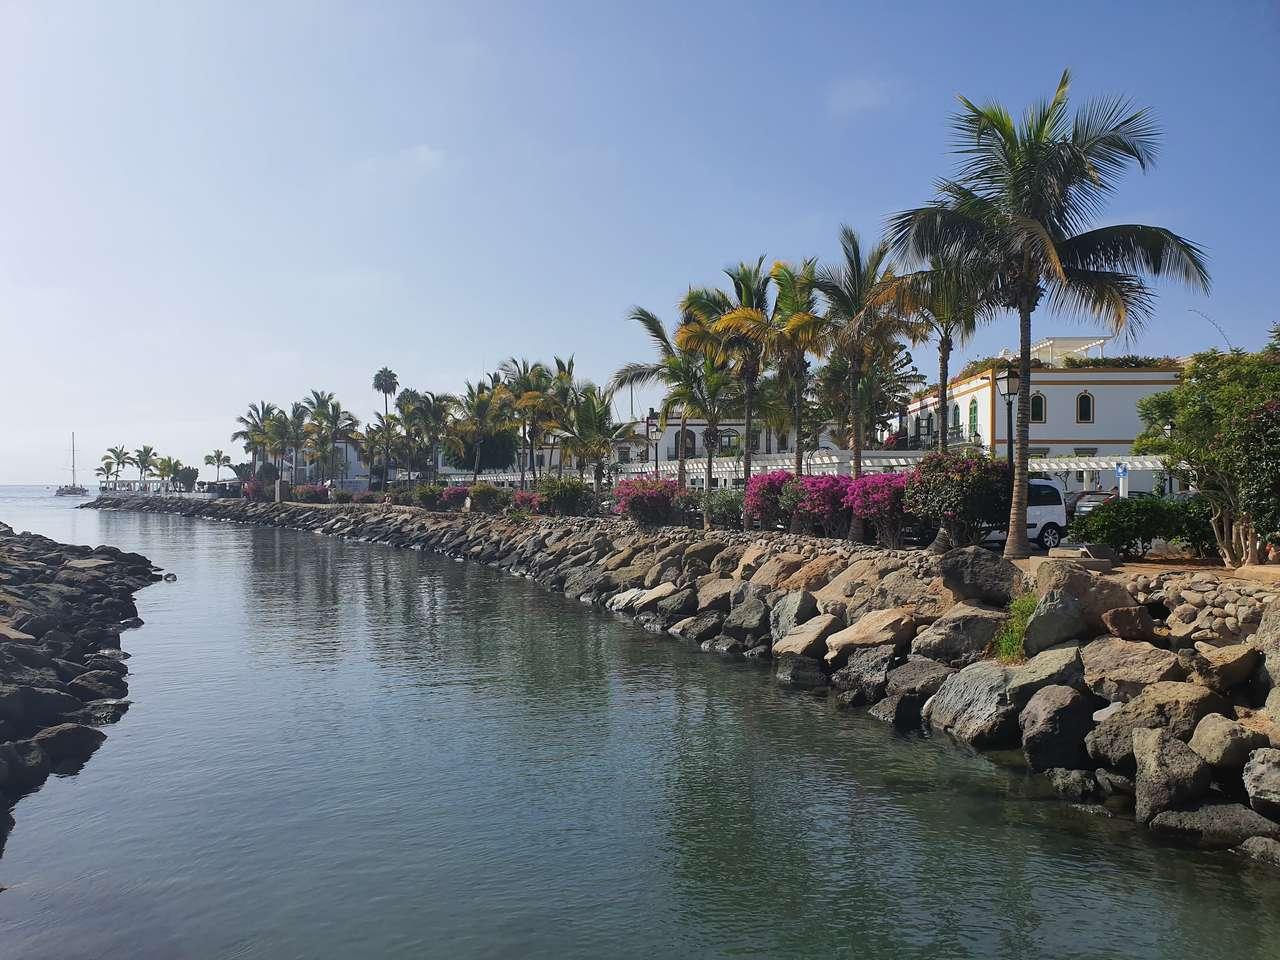 Puerto de Mogan puzzle online